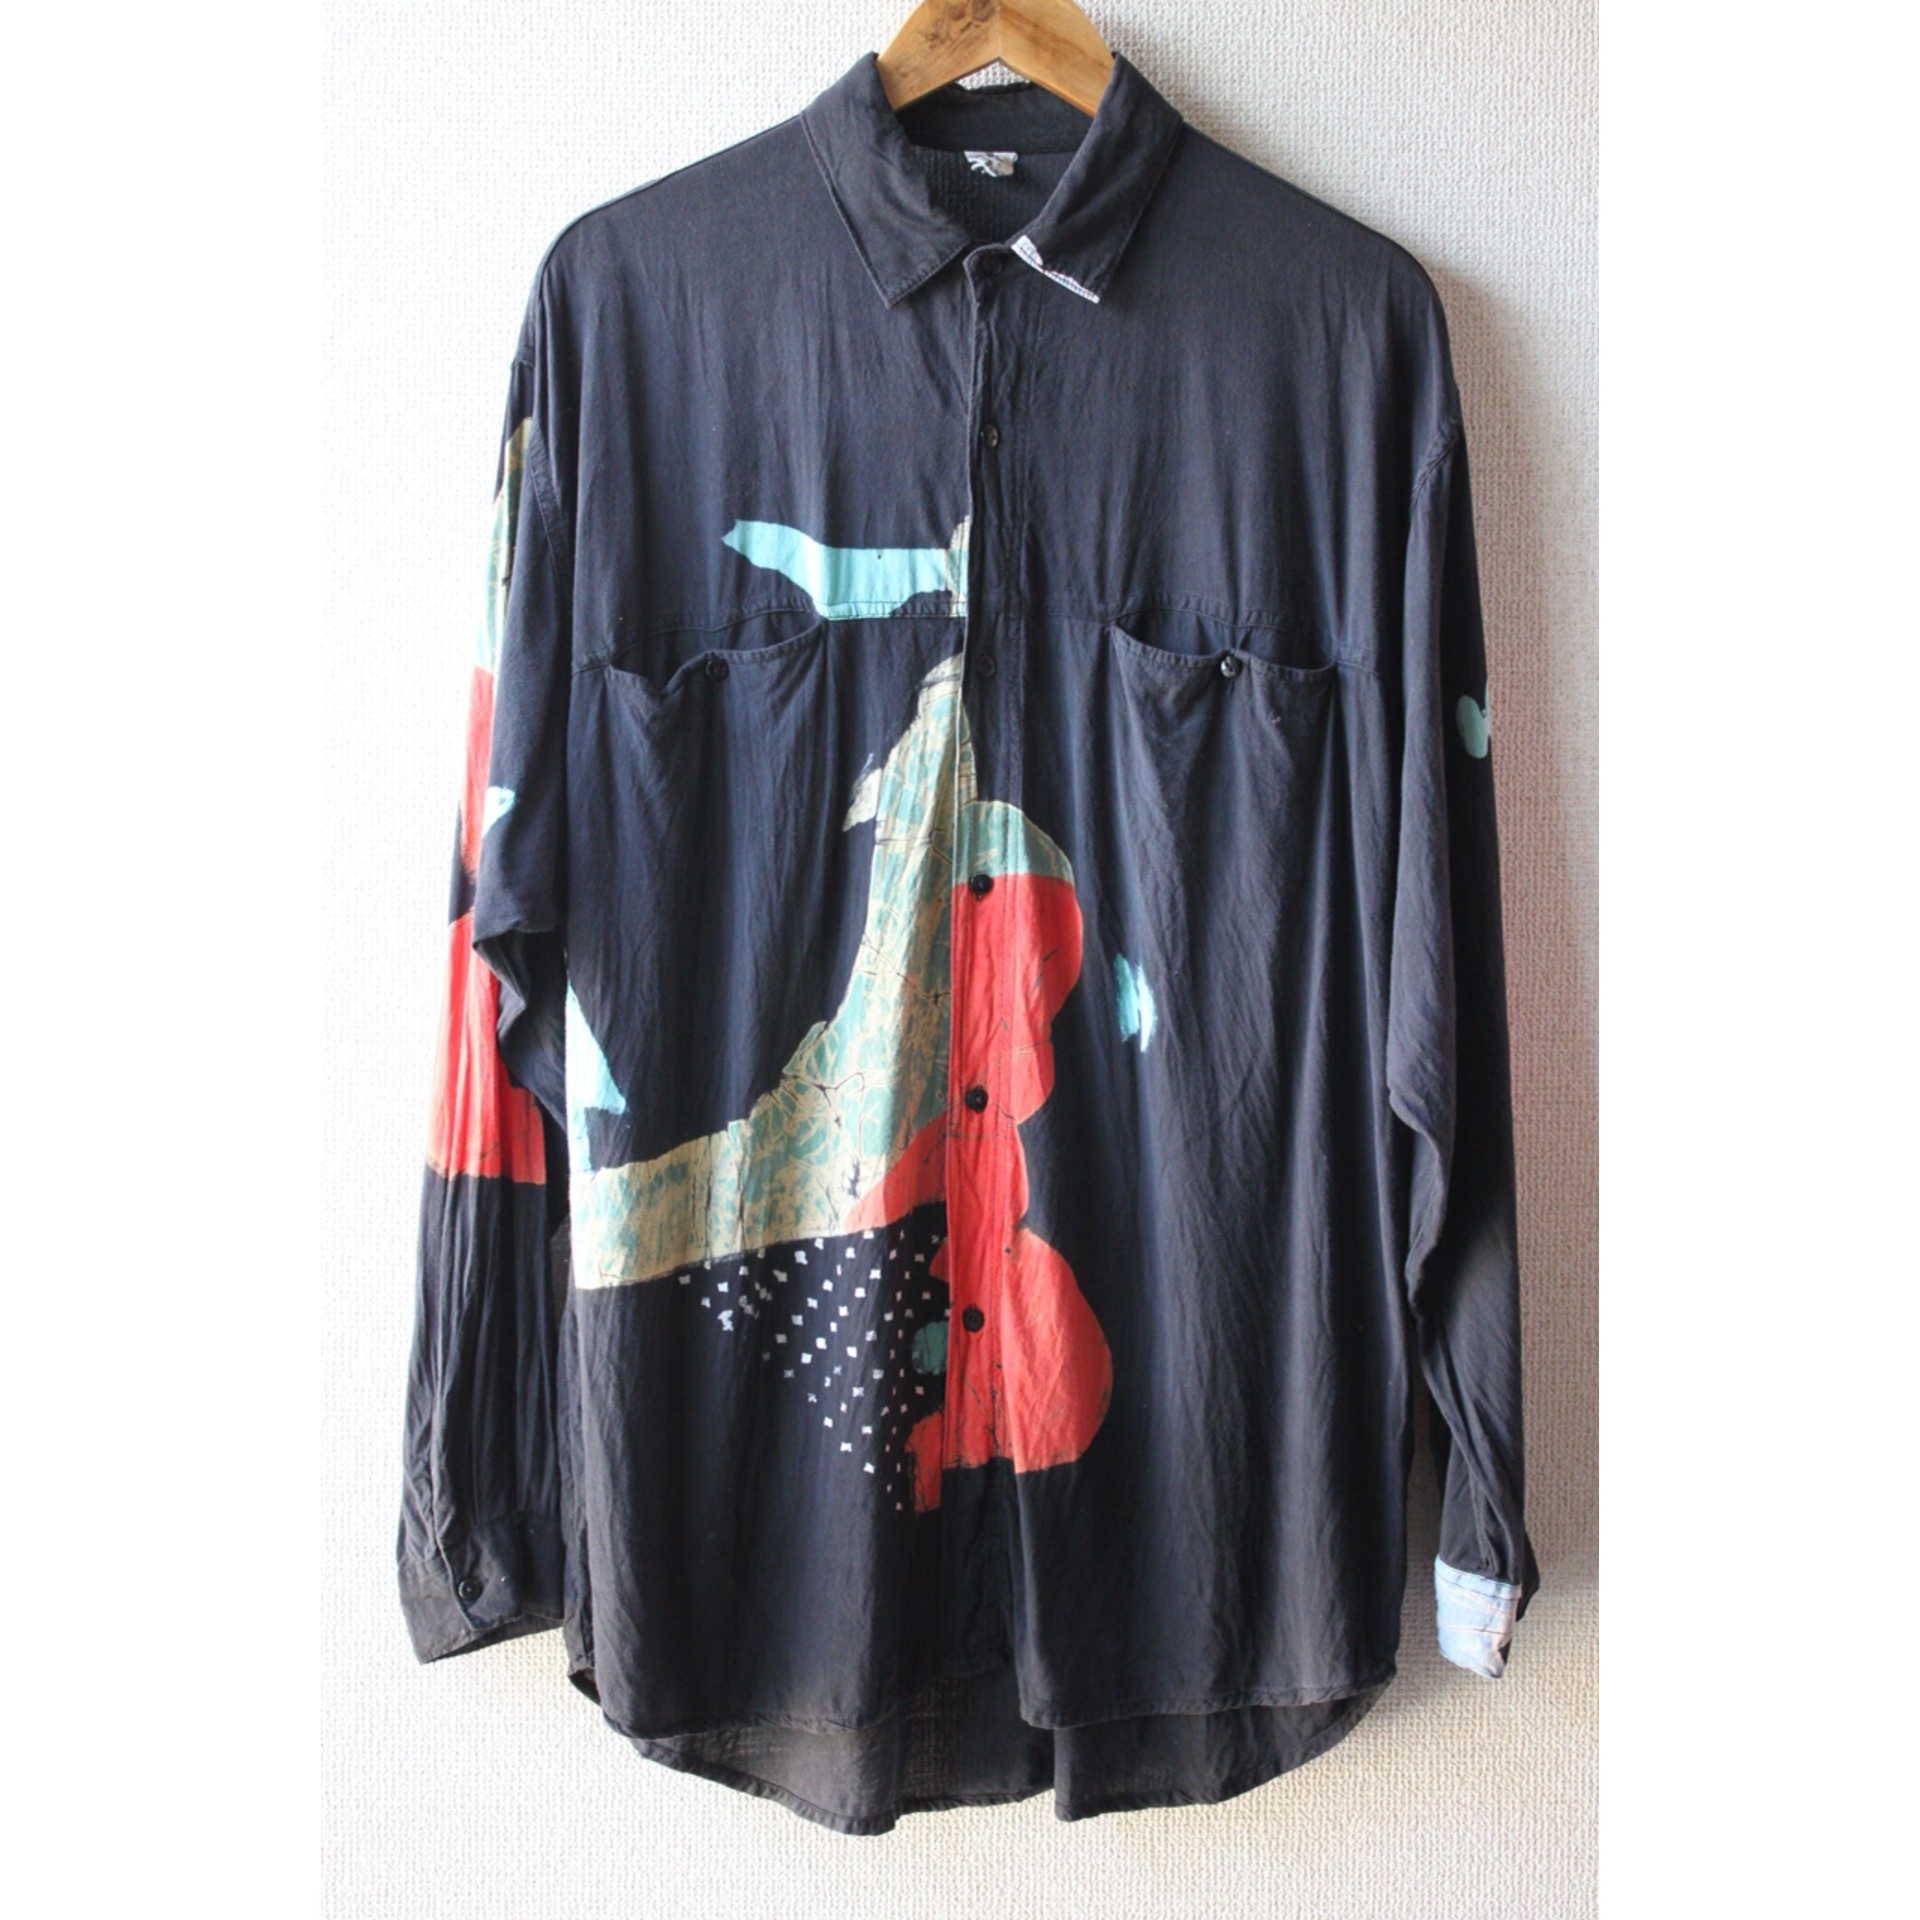 Vintage monotone print shirt